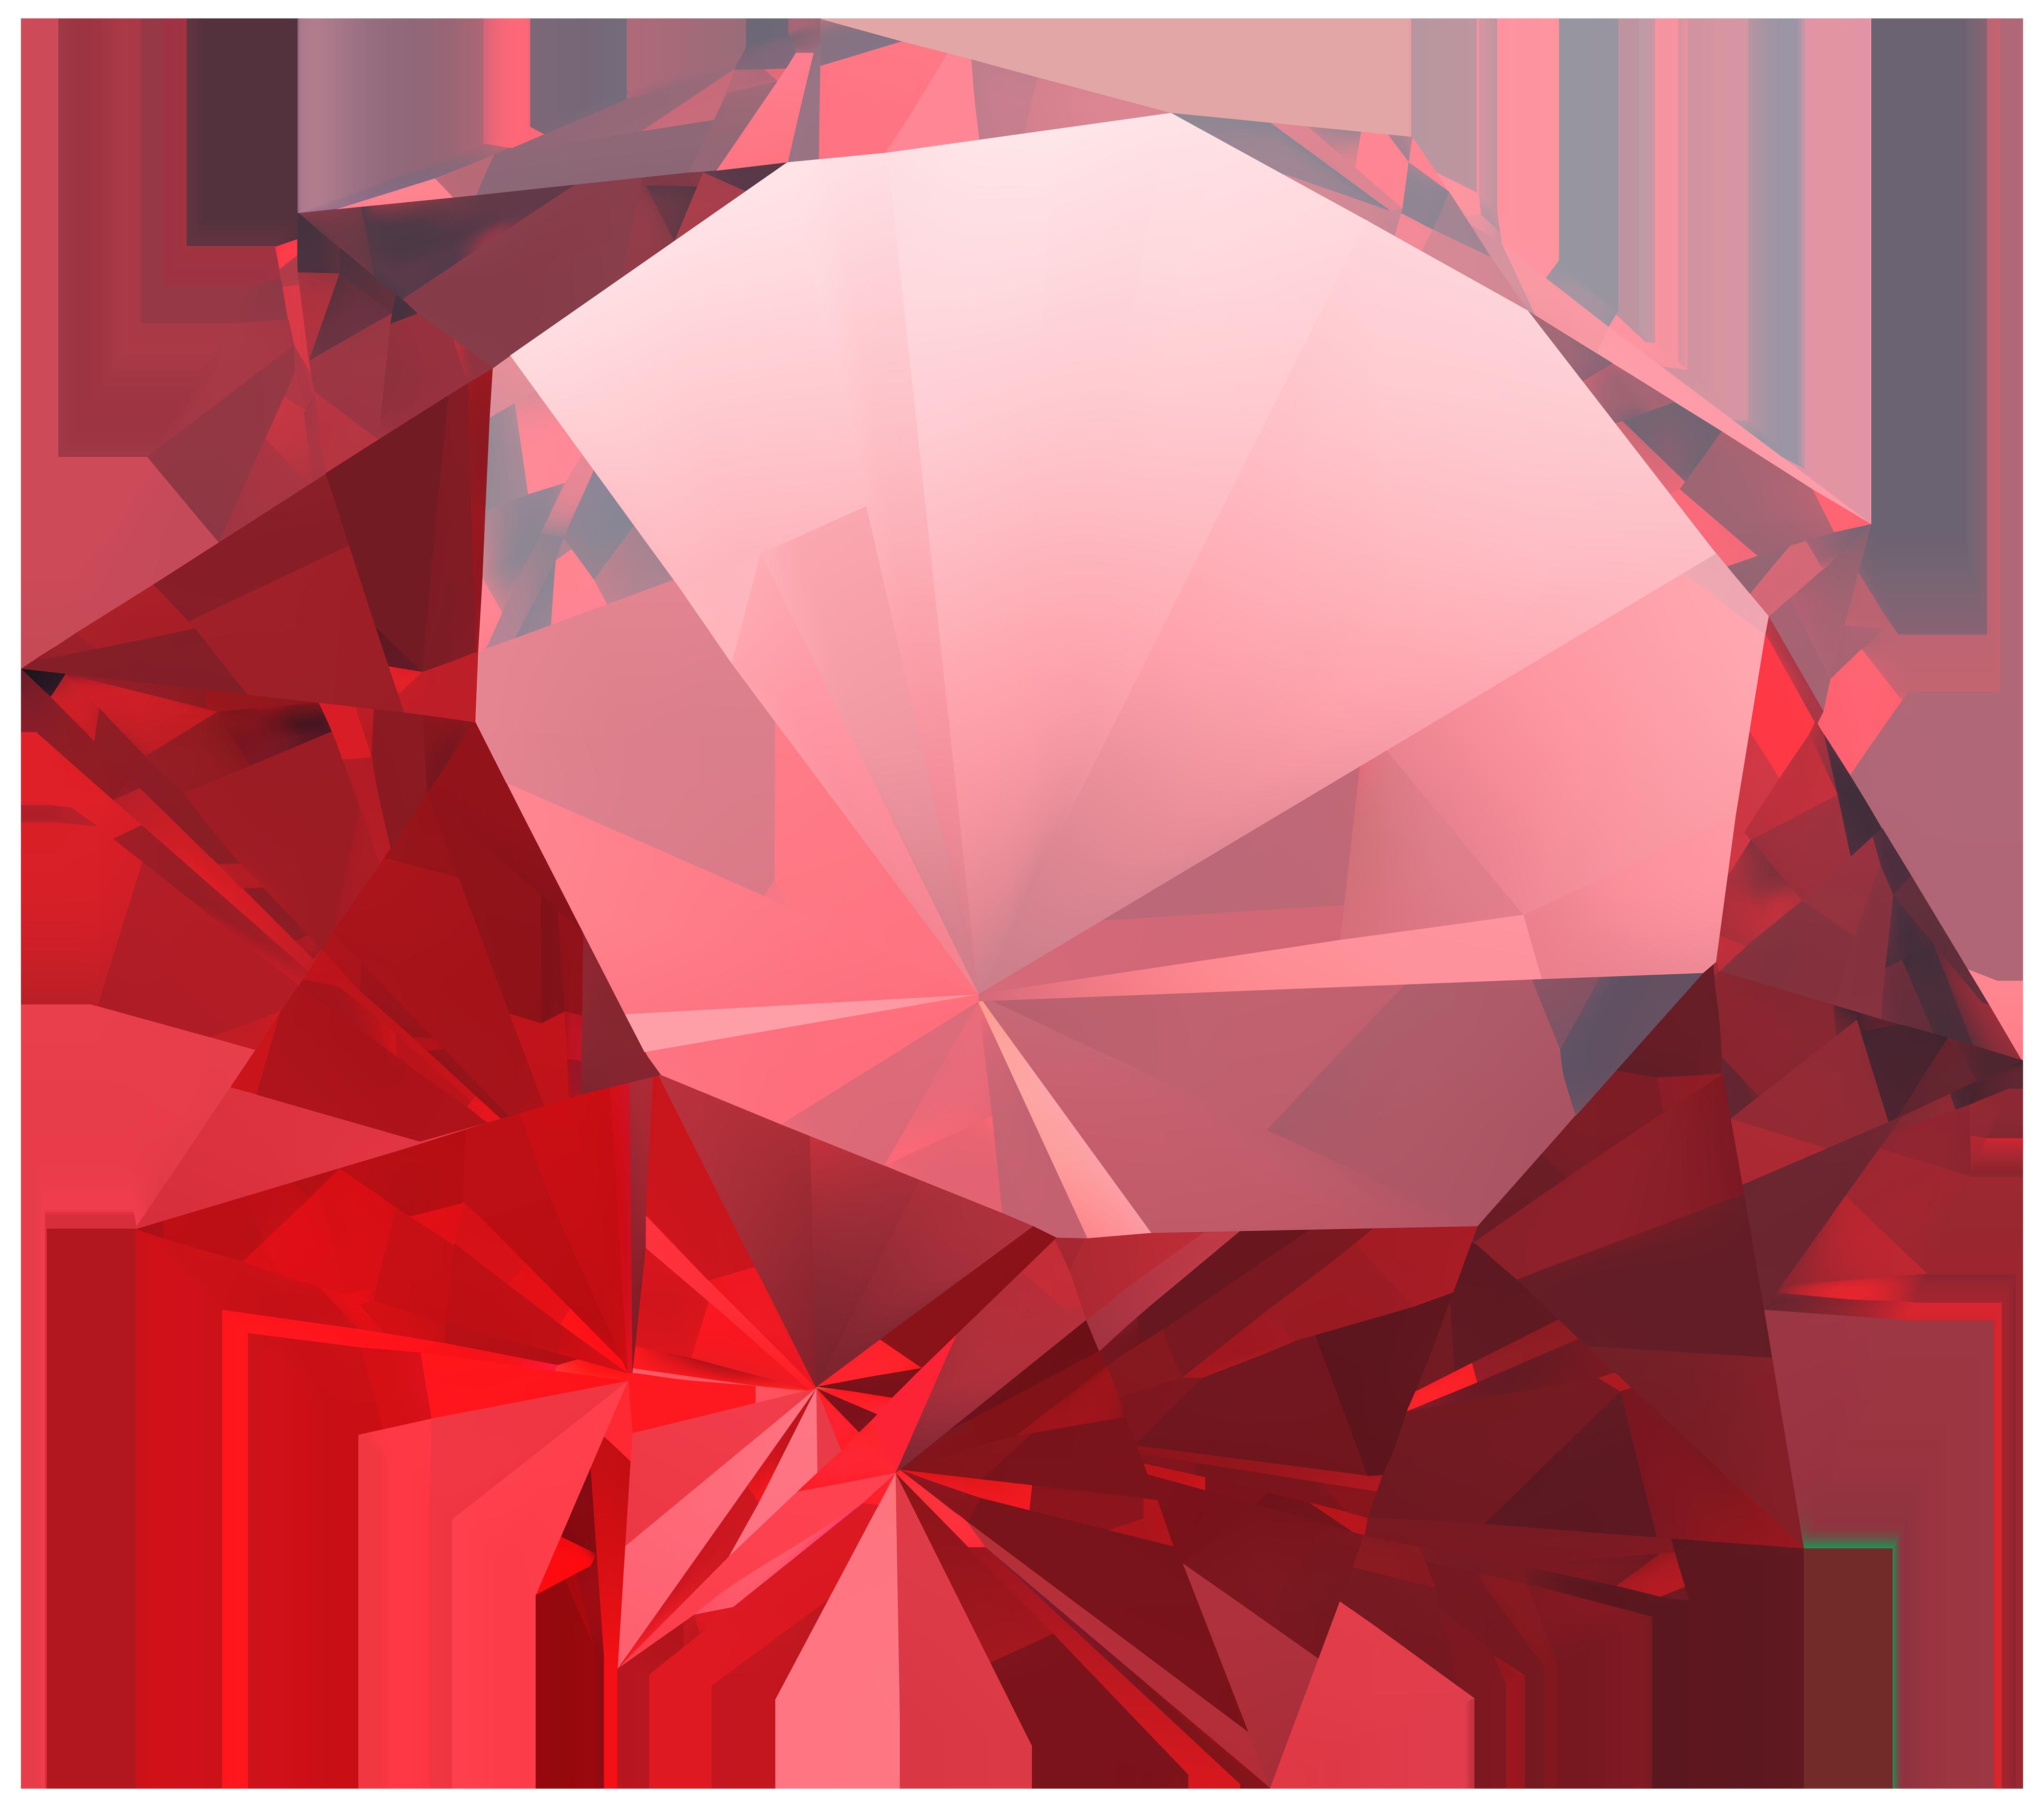 Png image best web. Diamond clipart red diamond